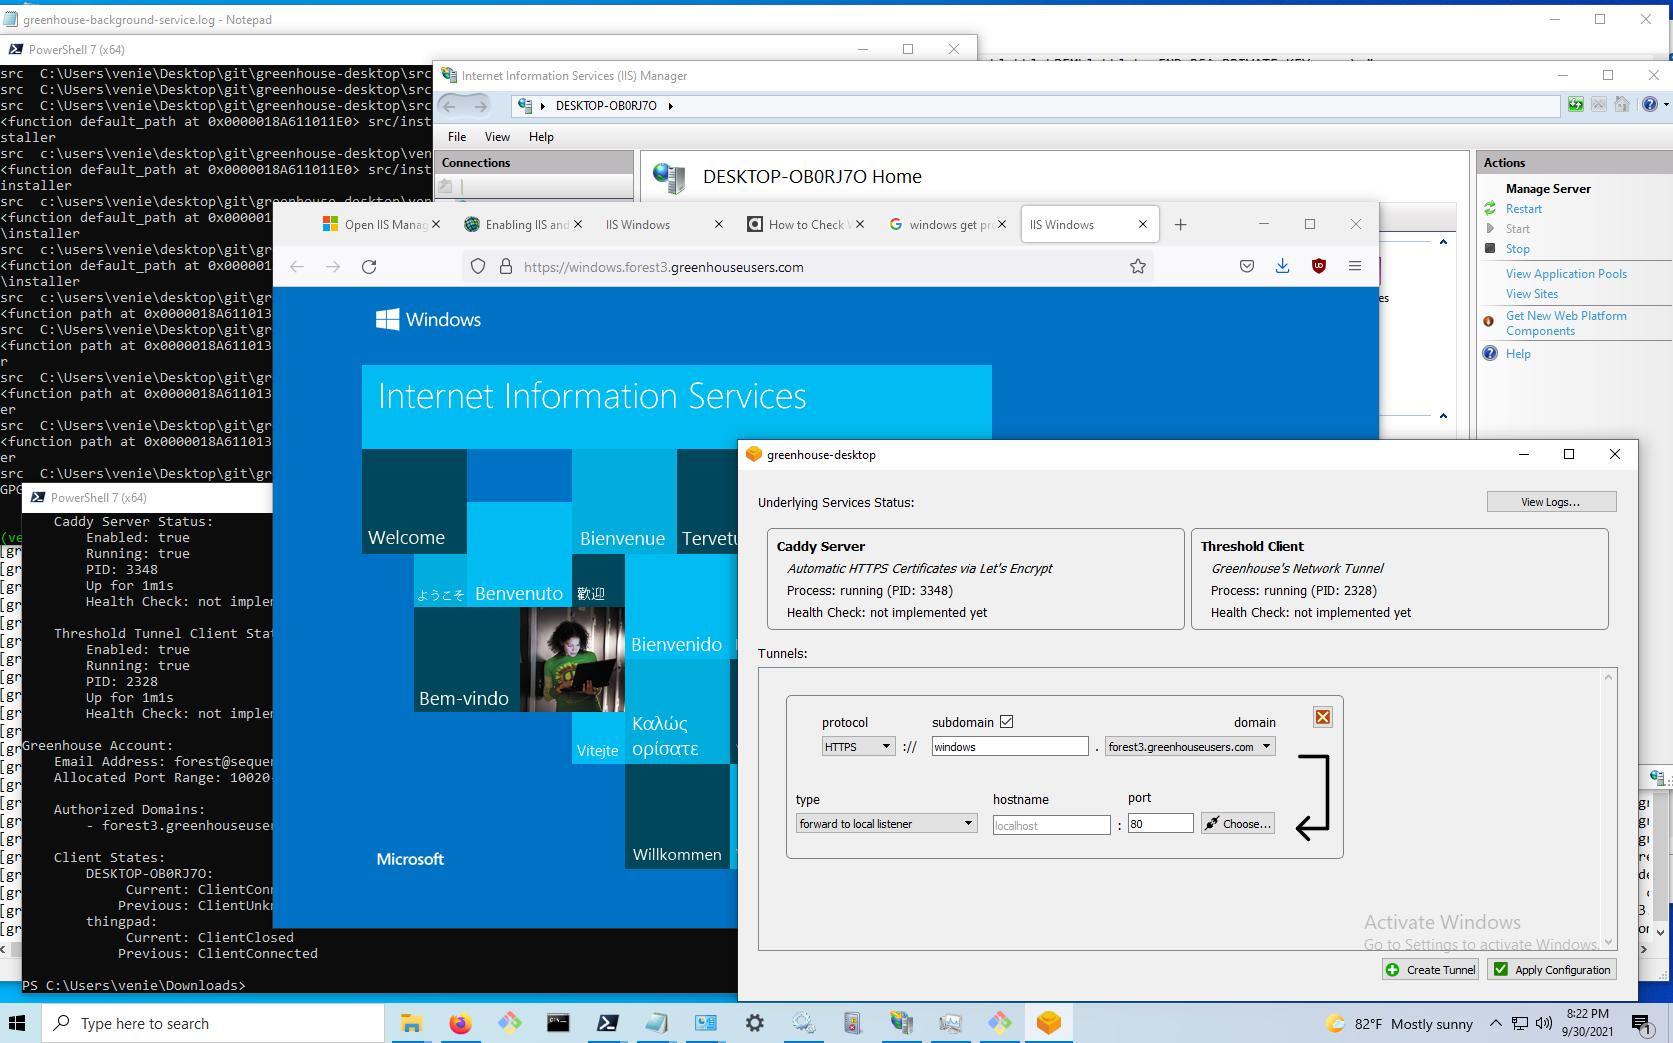 screenshot of a windows desktop displaying IIS (internet information services, the default web server on windows) being tunneled through greenhouse